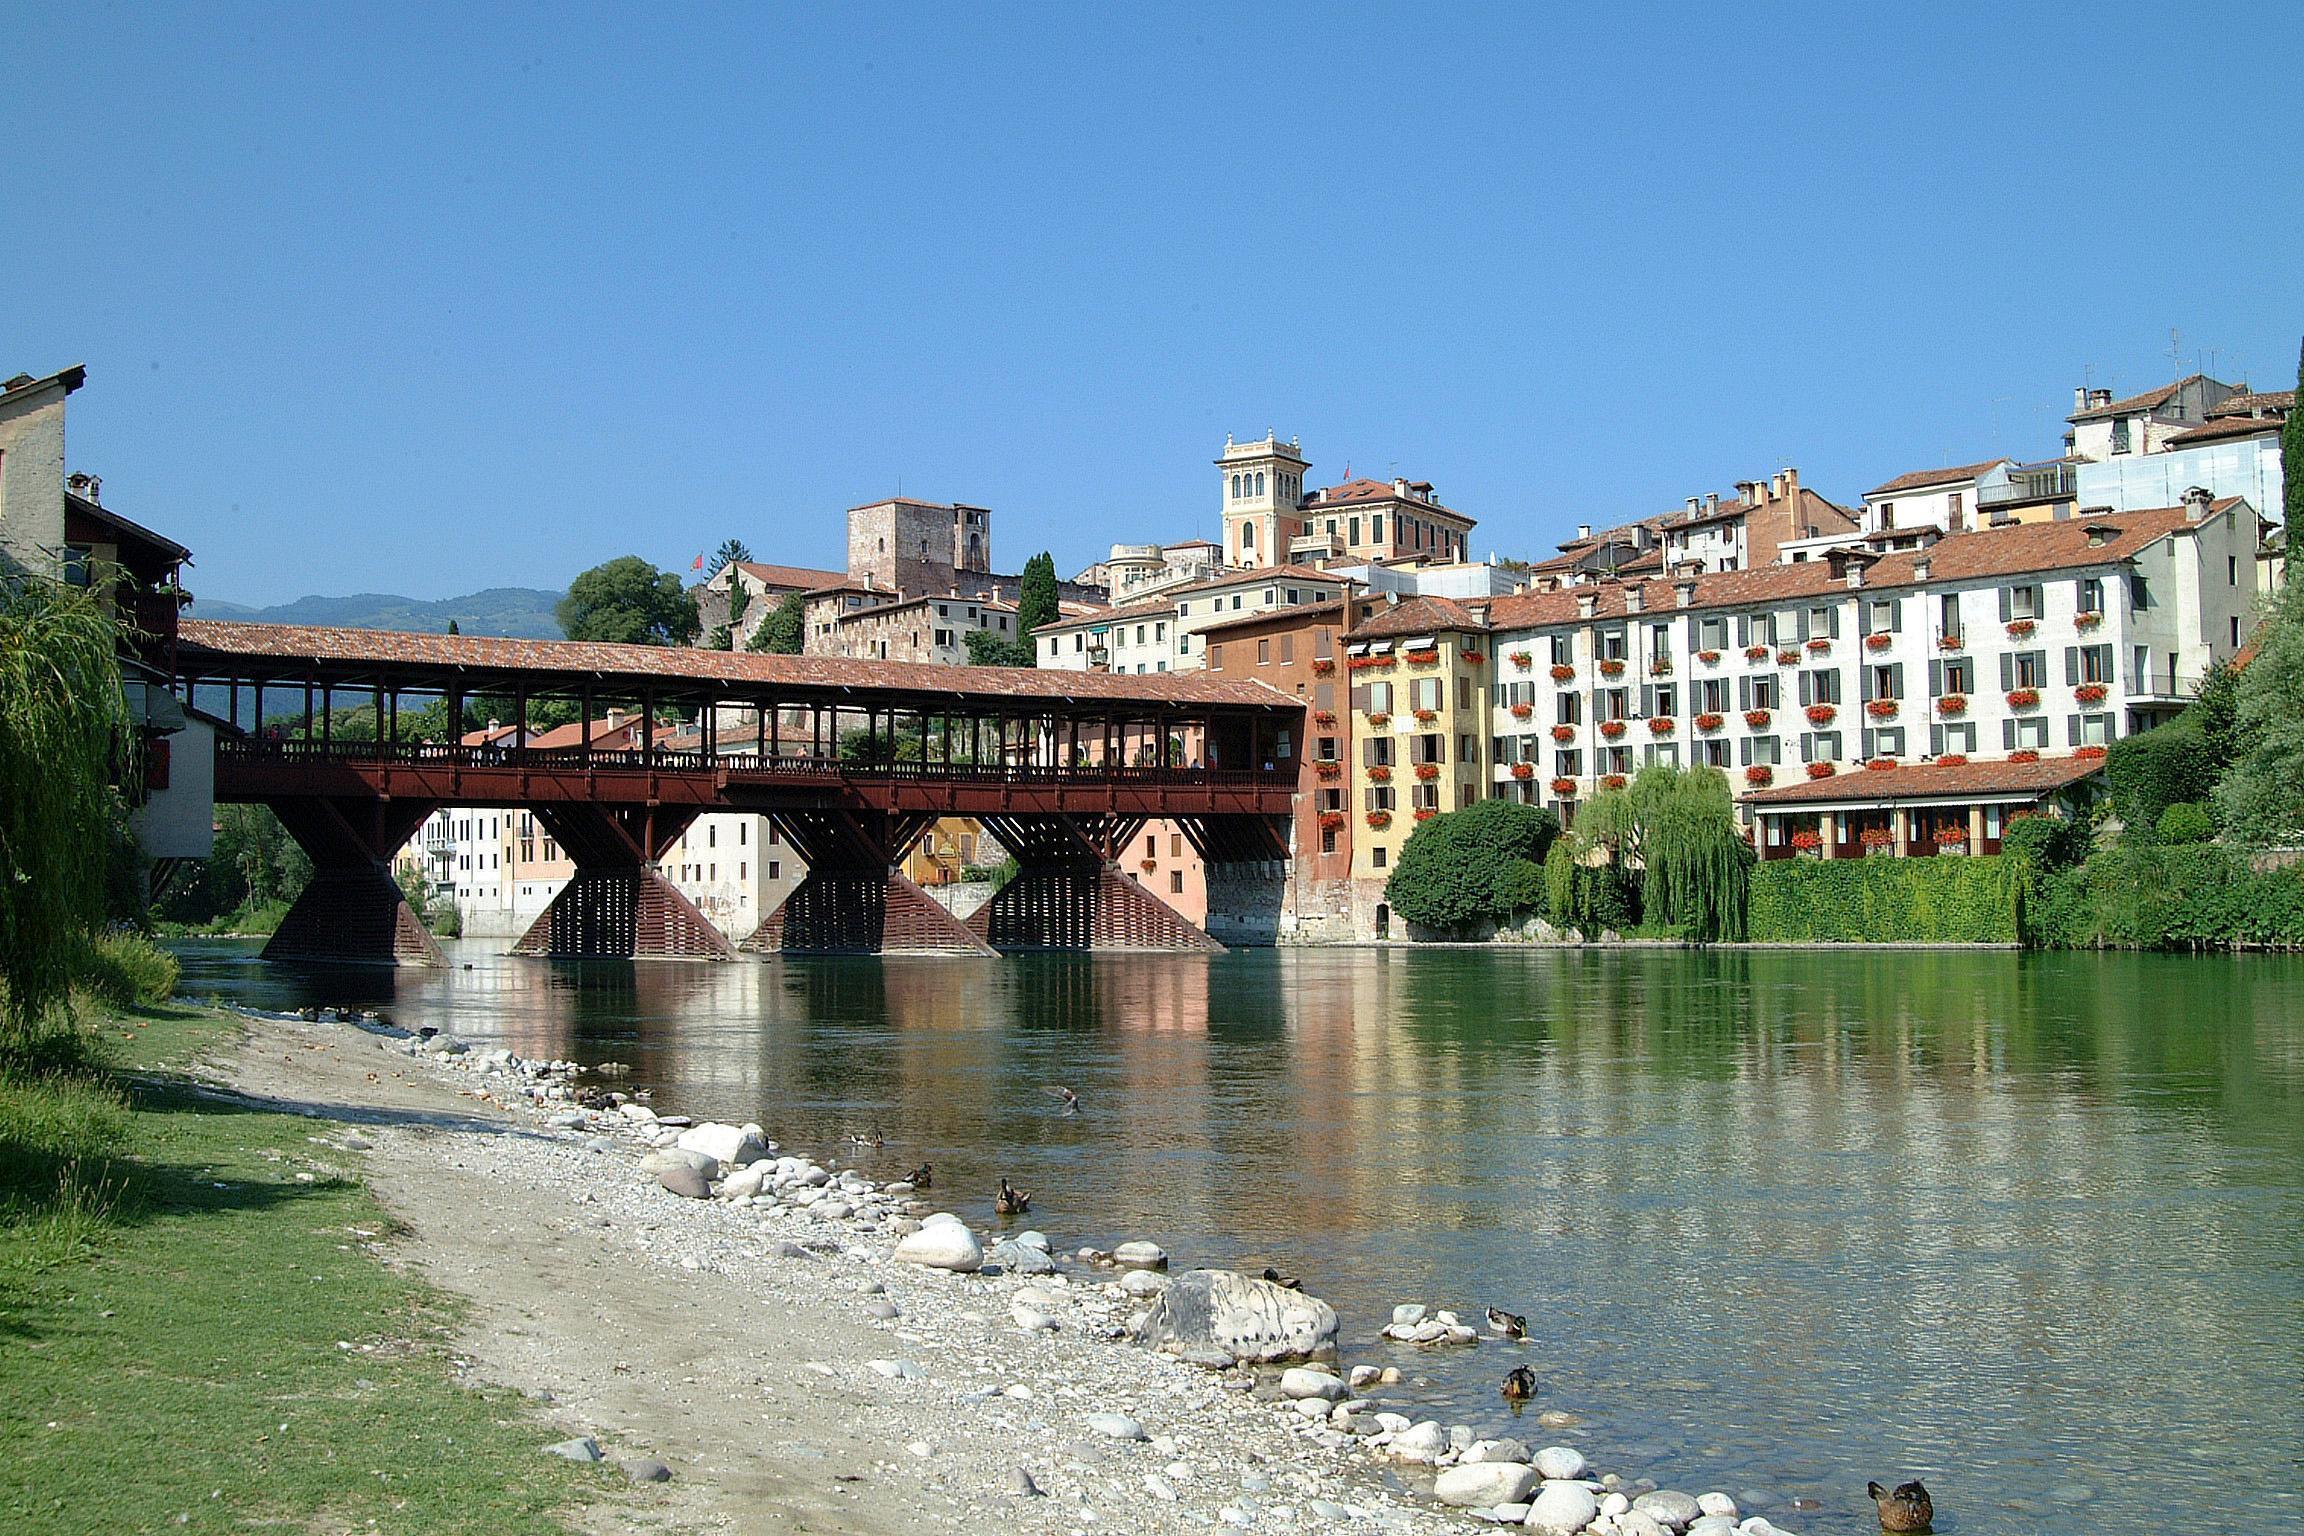 Veneto Day Trips from Venice